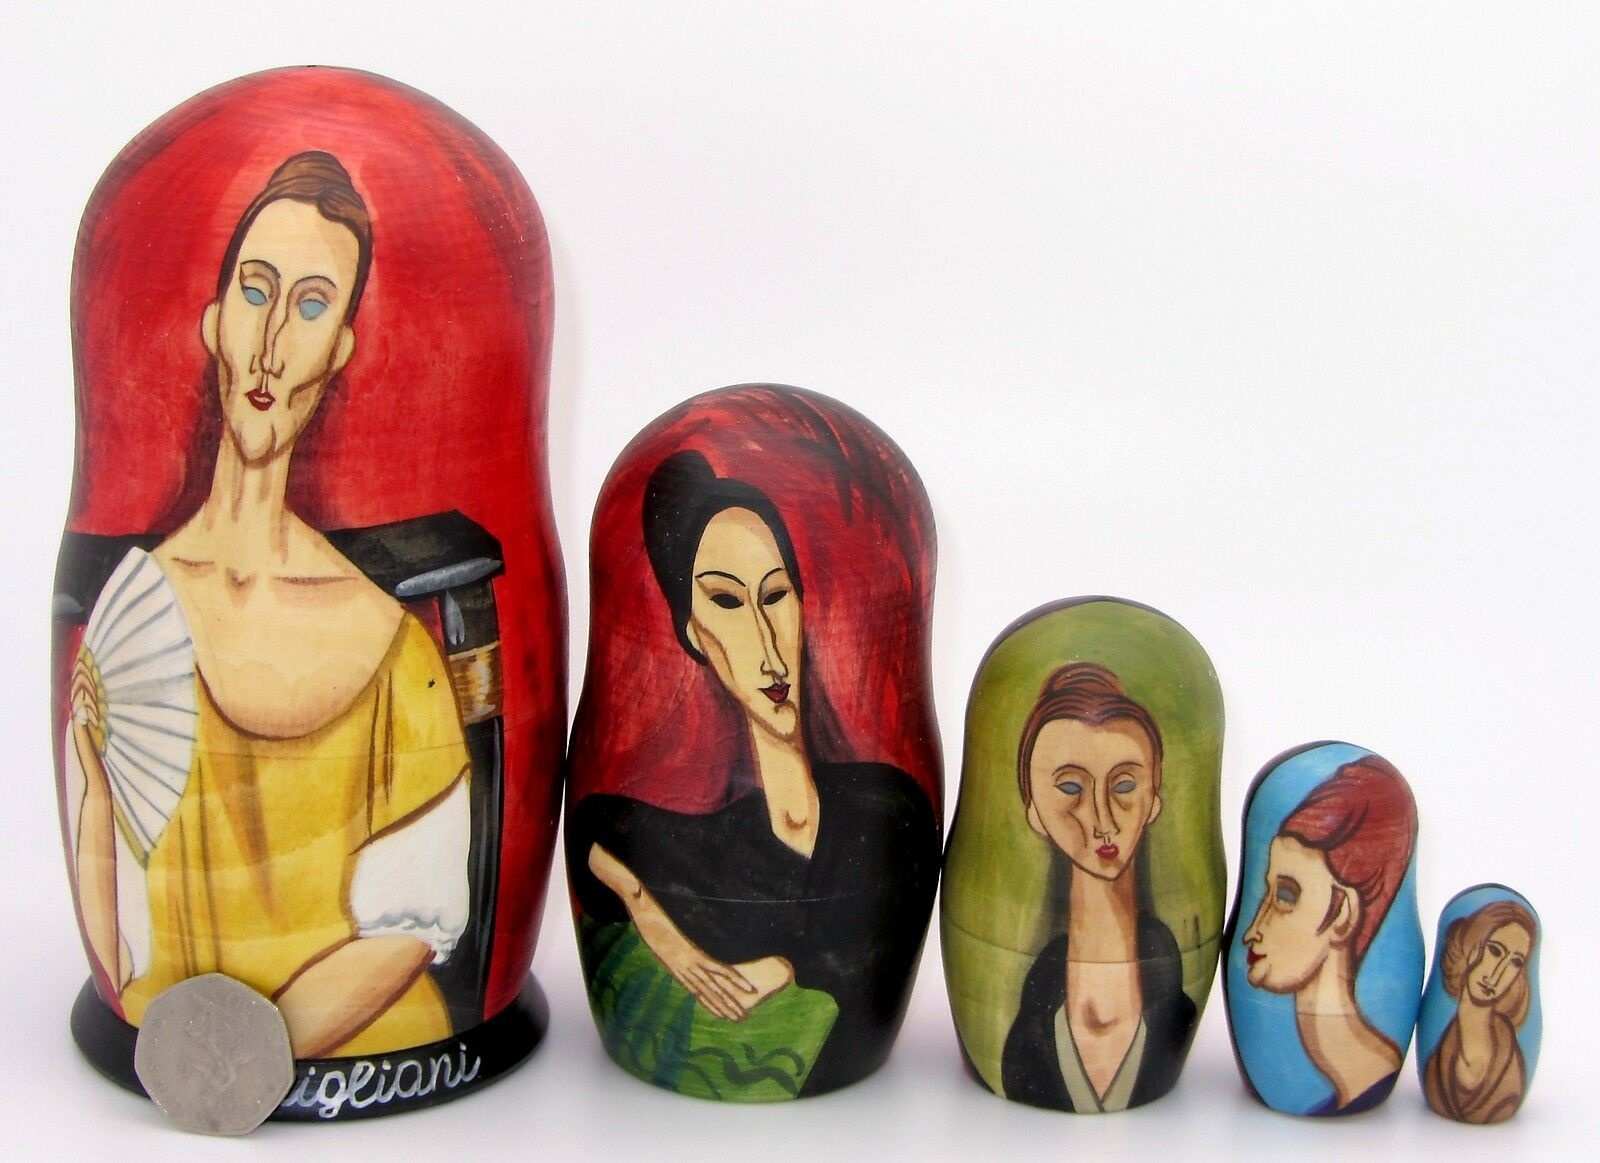 Russian Matryoshka with Nesting Dolls Modigliani Woman with Matryoshka Fan Lunia Czechowska 5 pc 2ed048